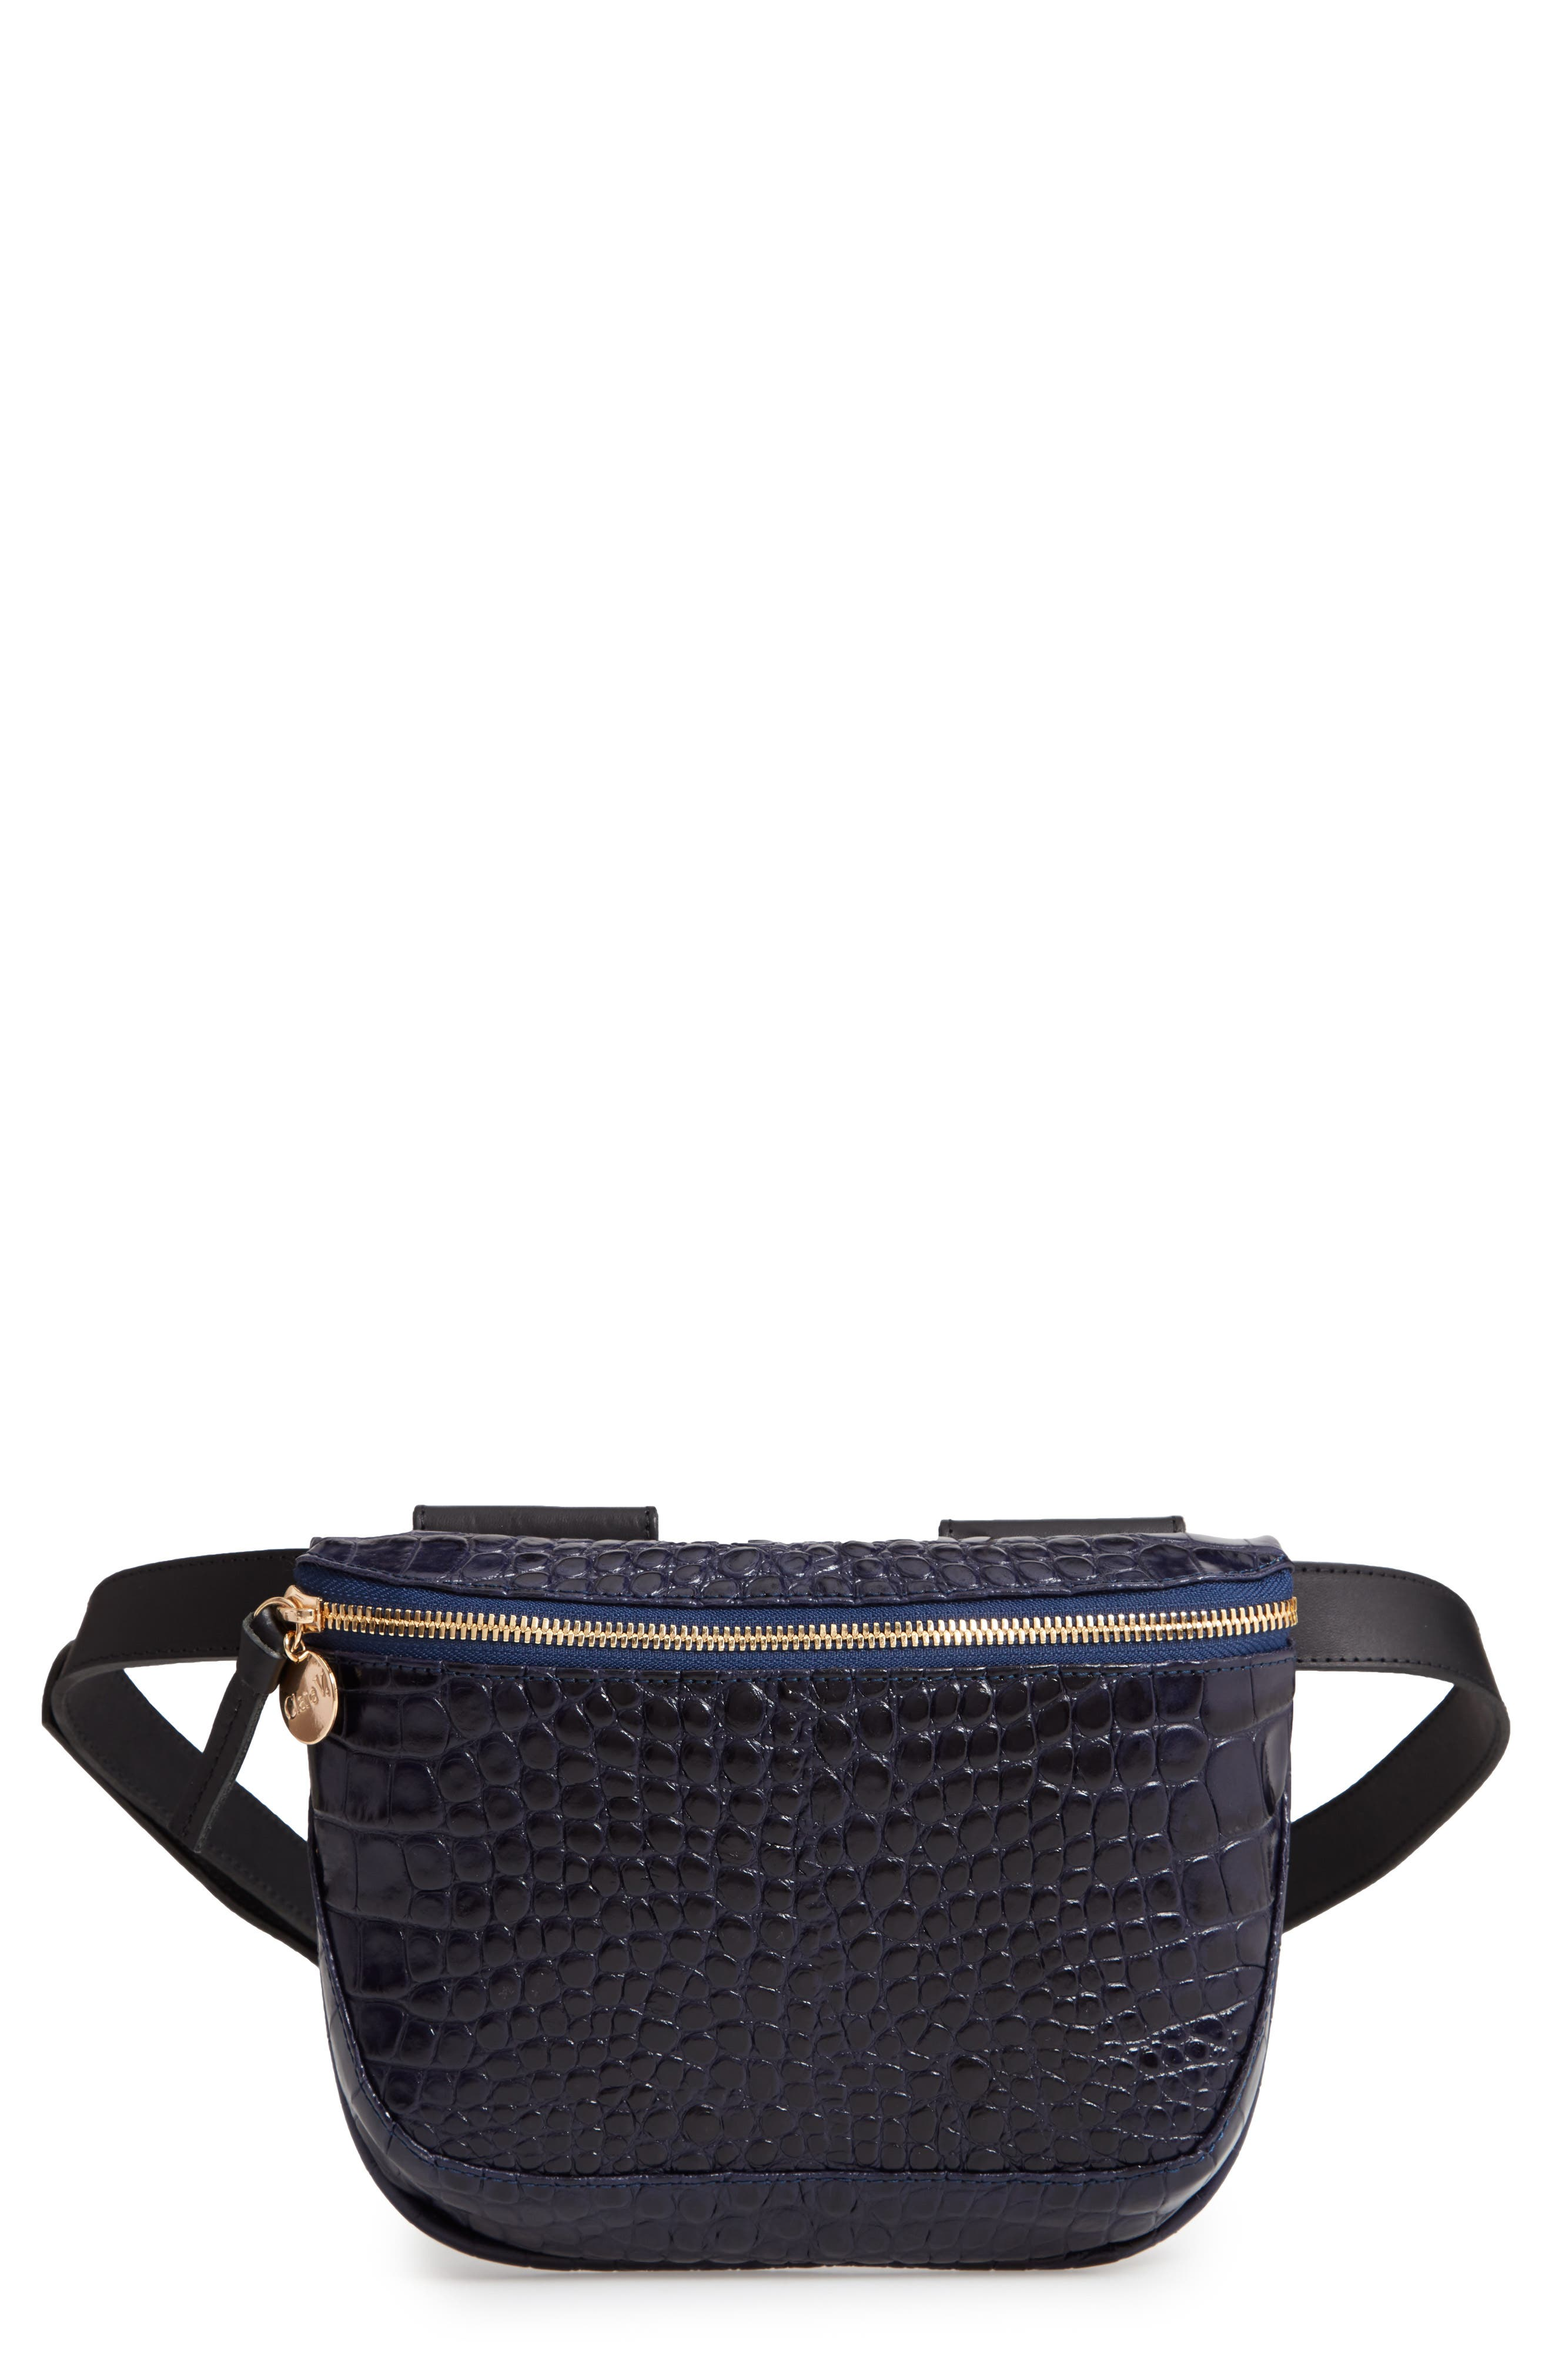 1d70b224d8 Clare V. Handbags   Wallets for Women